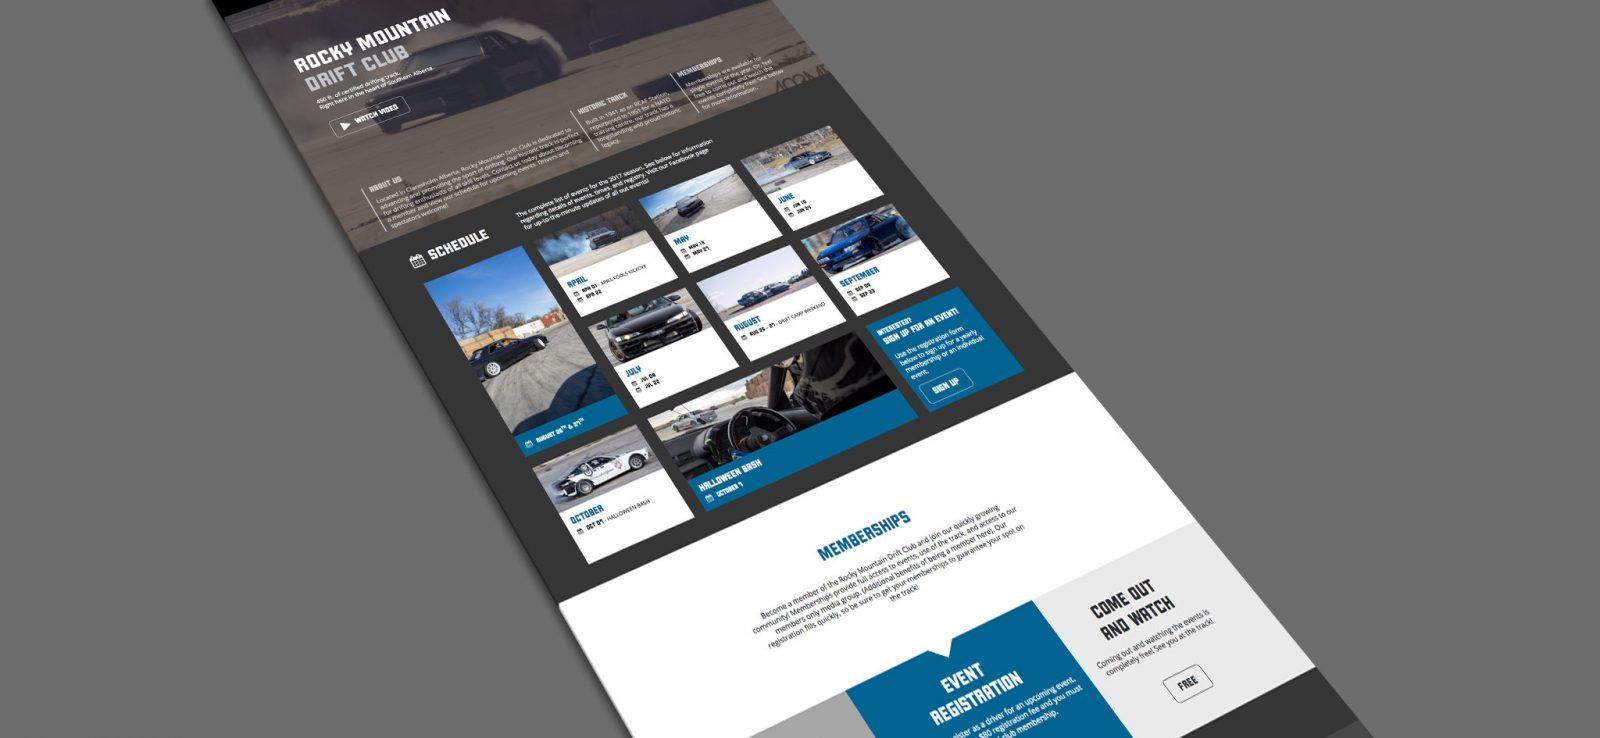 Rocky Mountain Drift Club - Web Design